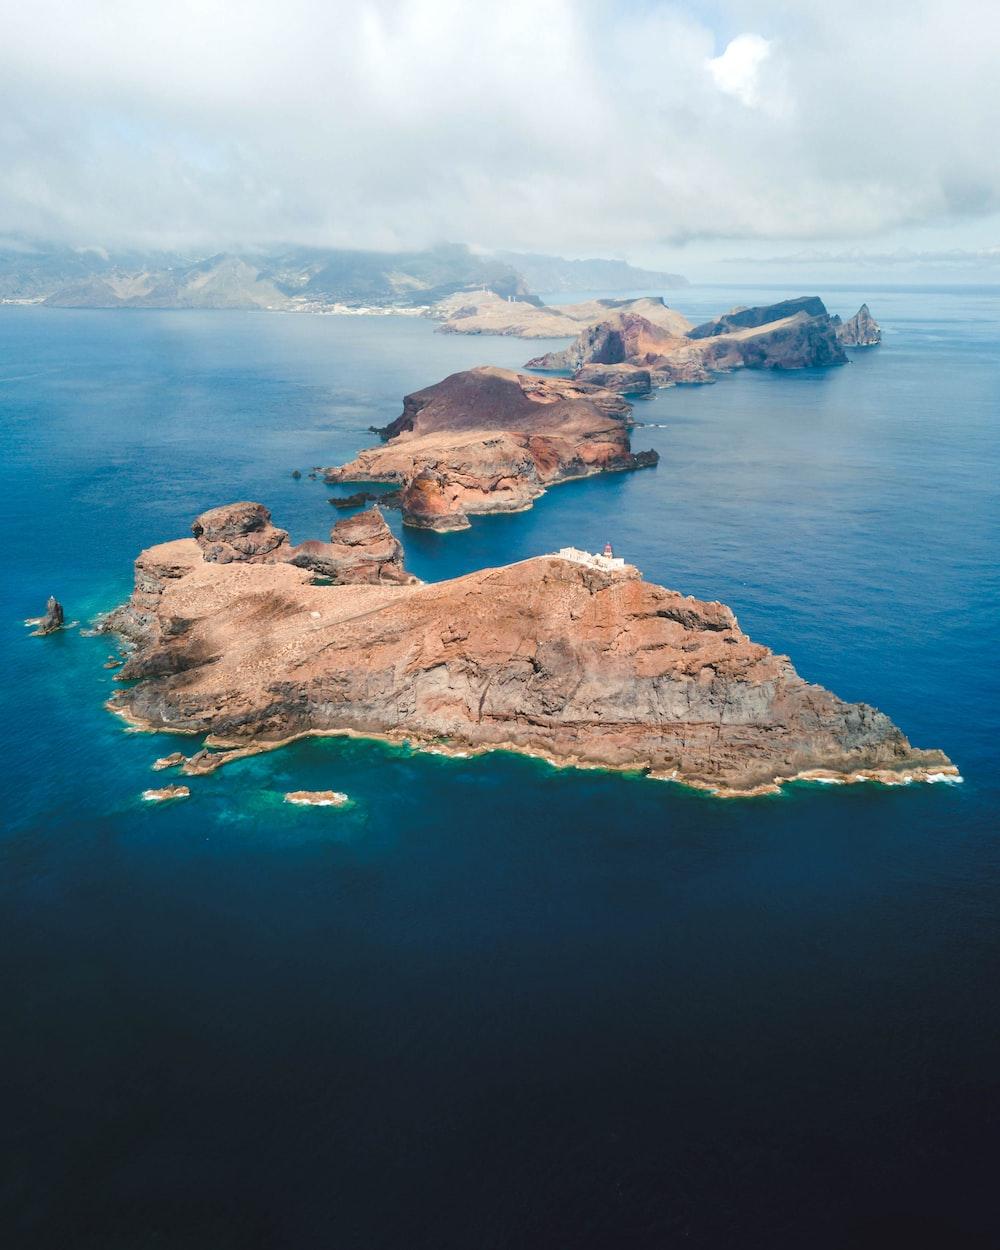 brown island during daytime